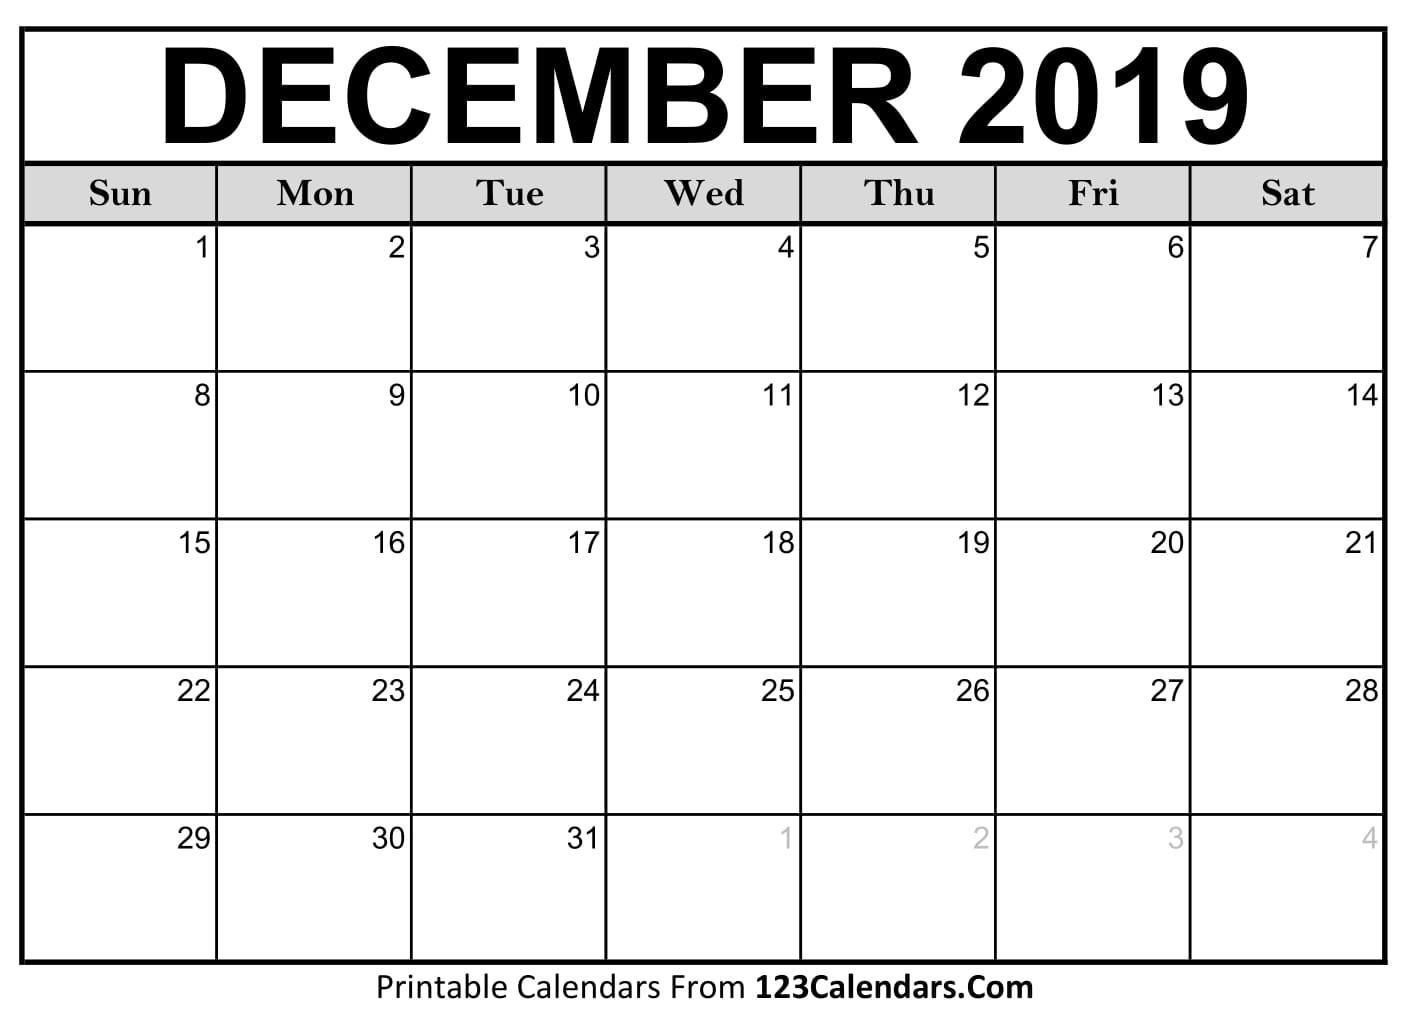 Printable December 2018 Calendar Templates 123Calendars